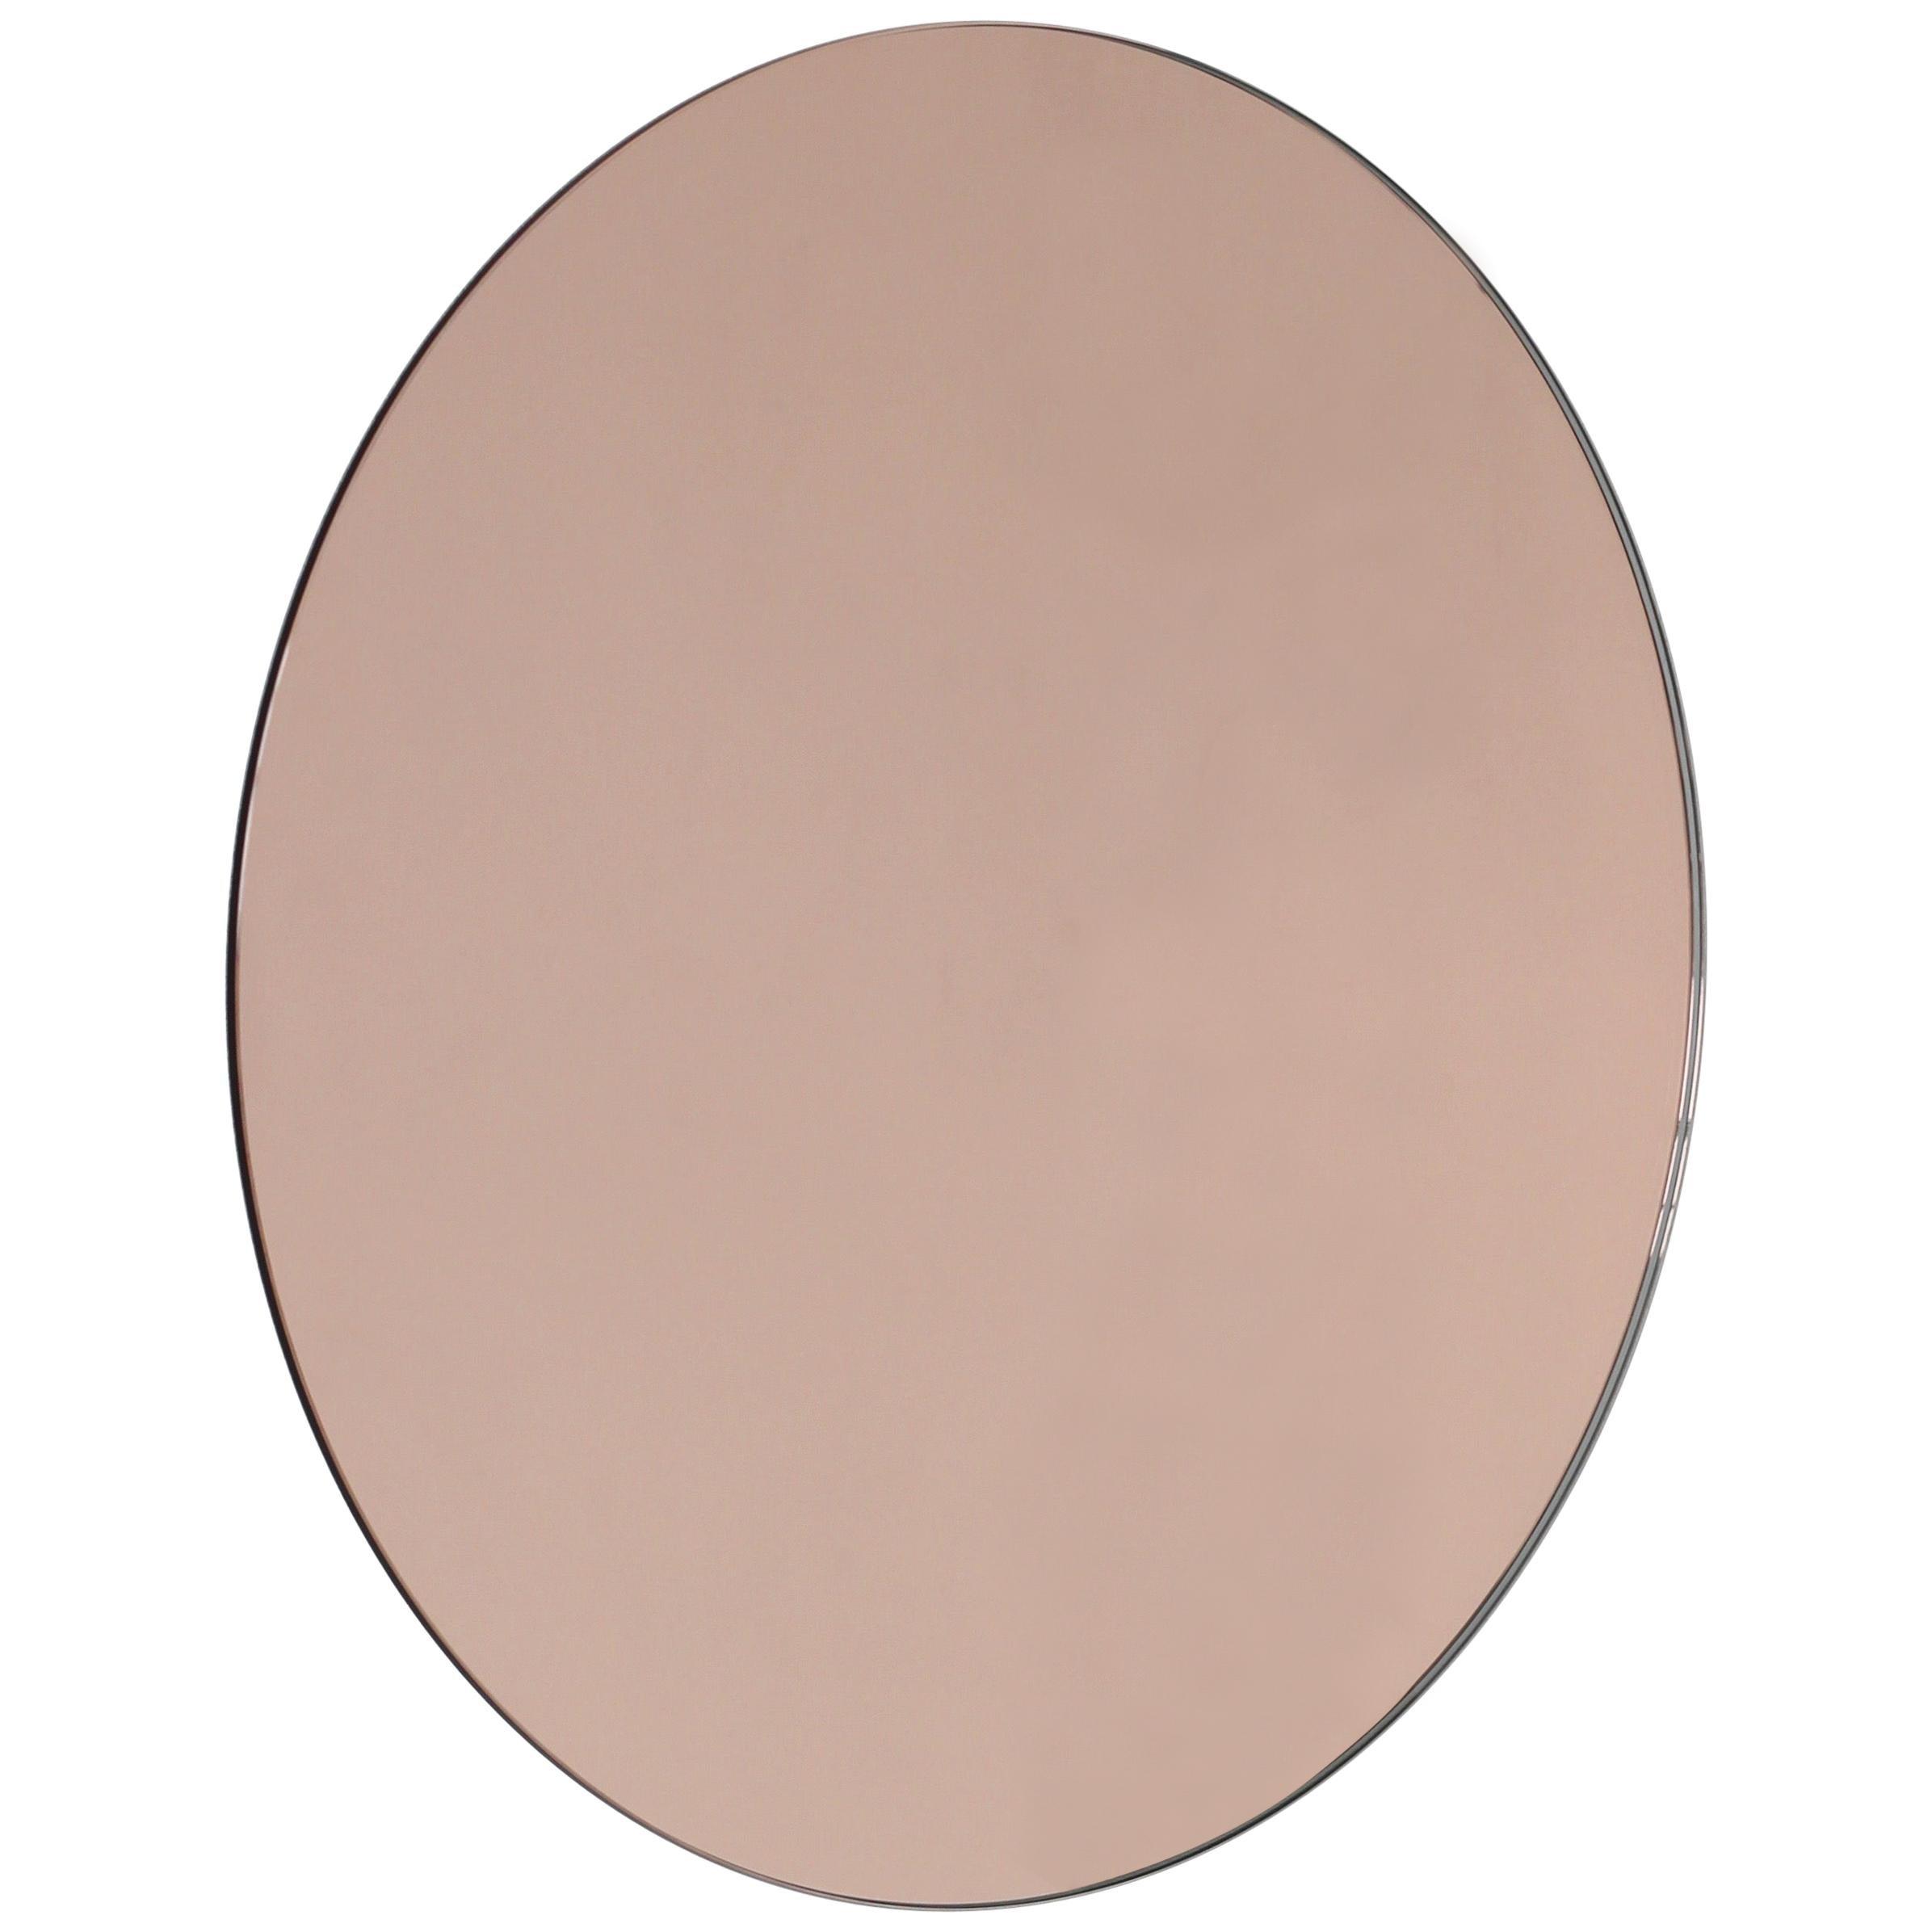 Orbis™ Rose / Peach Tinted Round Modern Frameless Mirror - Oversized,Extra Large